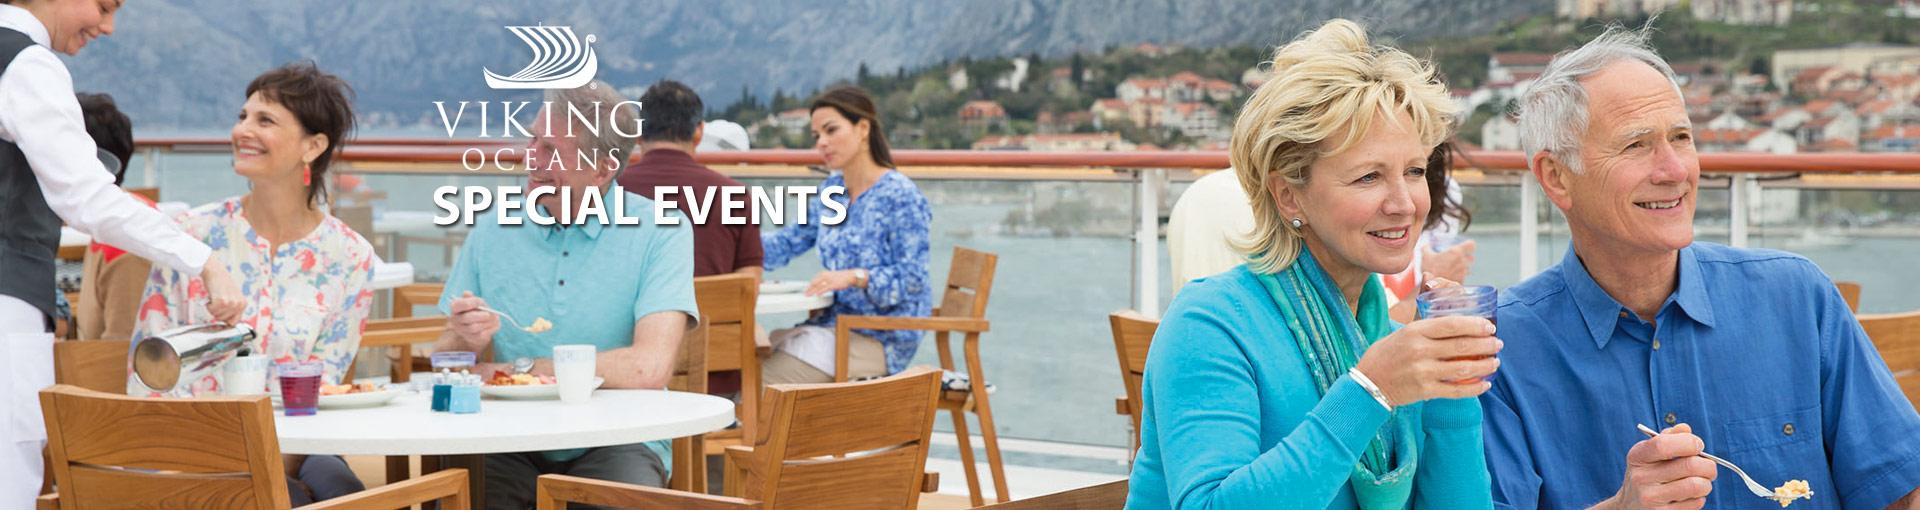 Viking Ocean Cruises Special Events